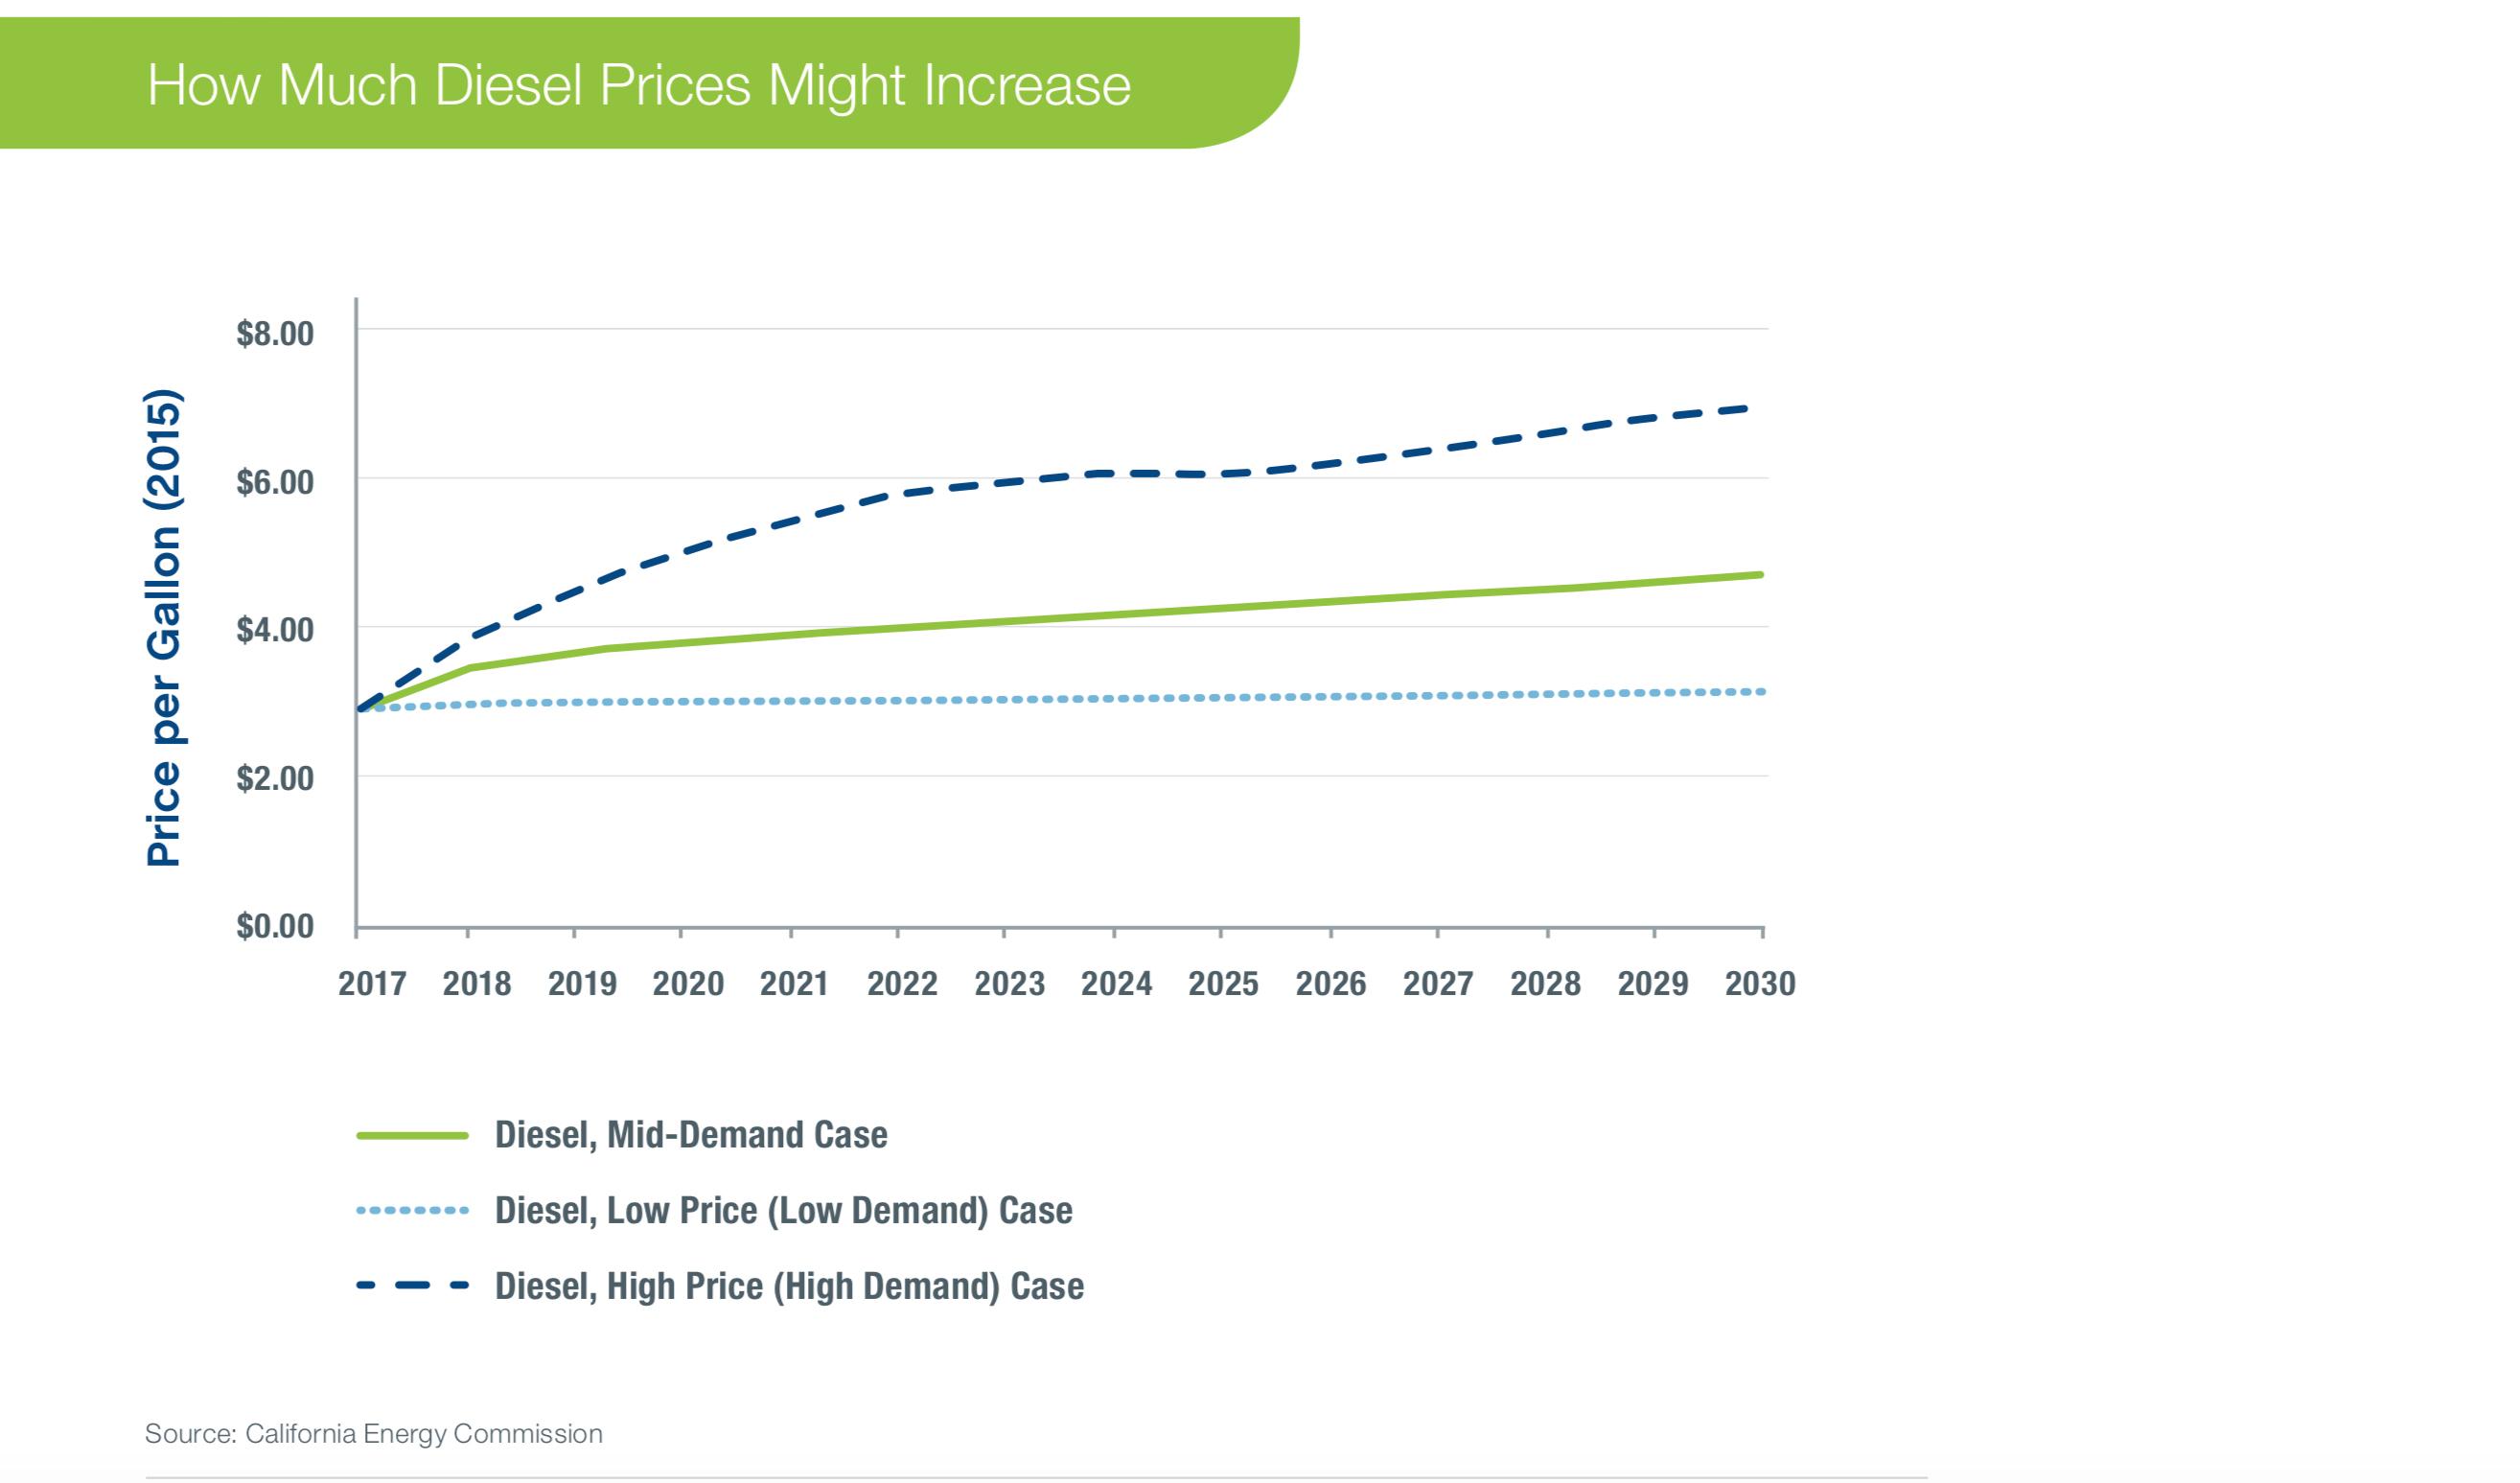 Diesel Prices Might Increase